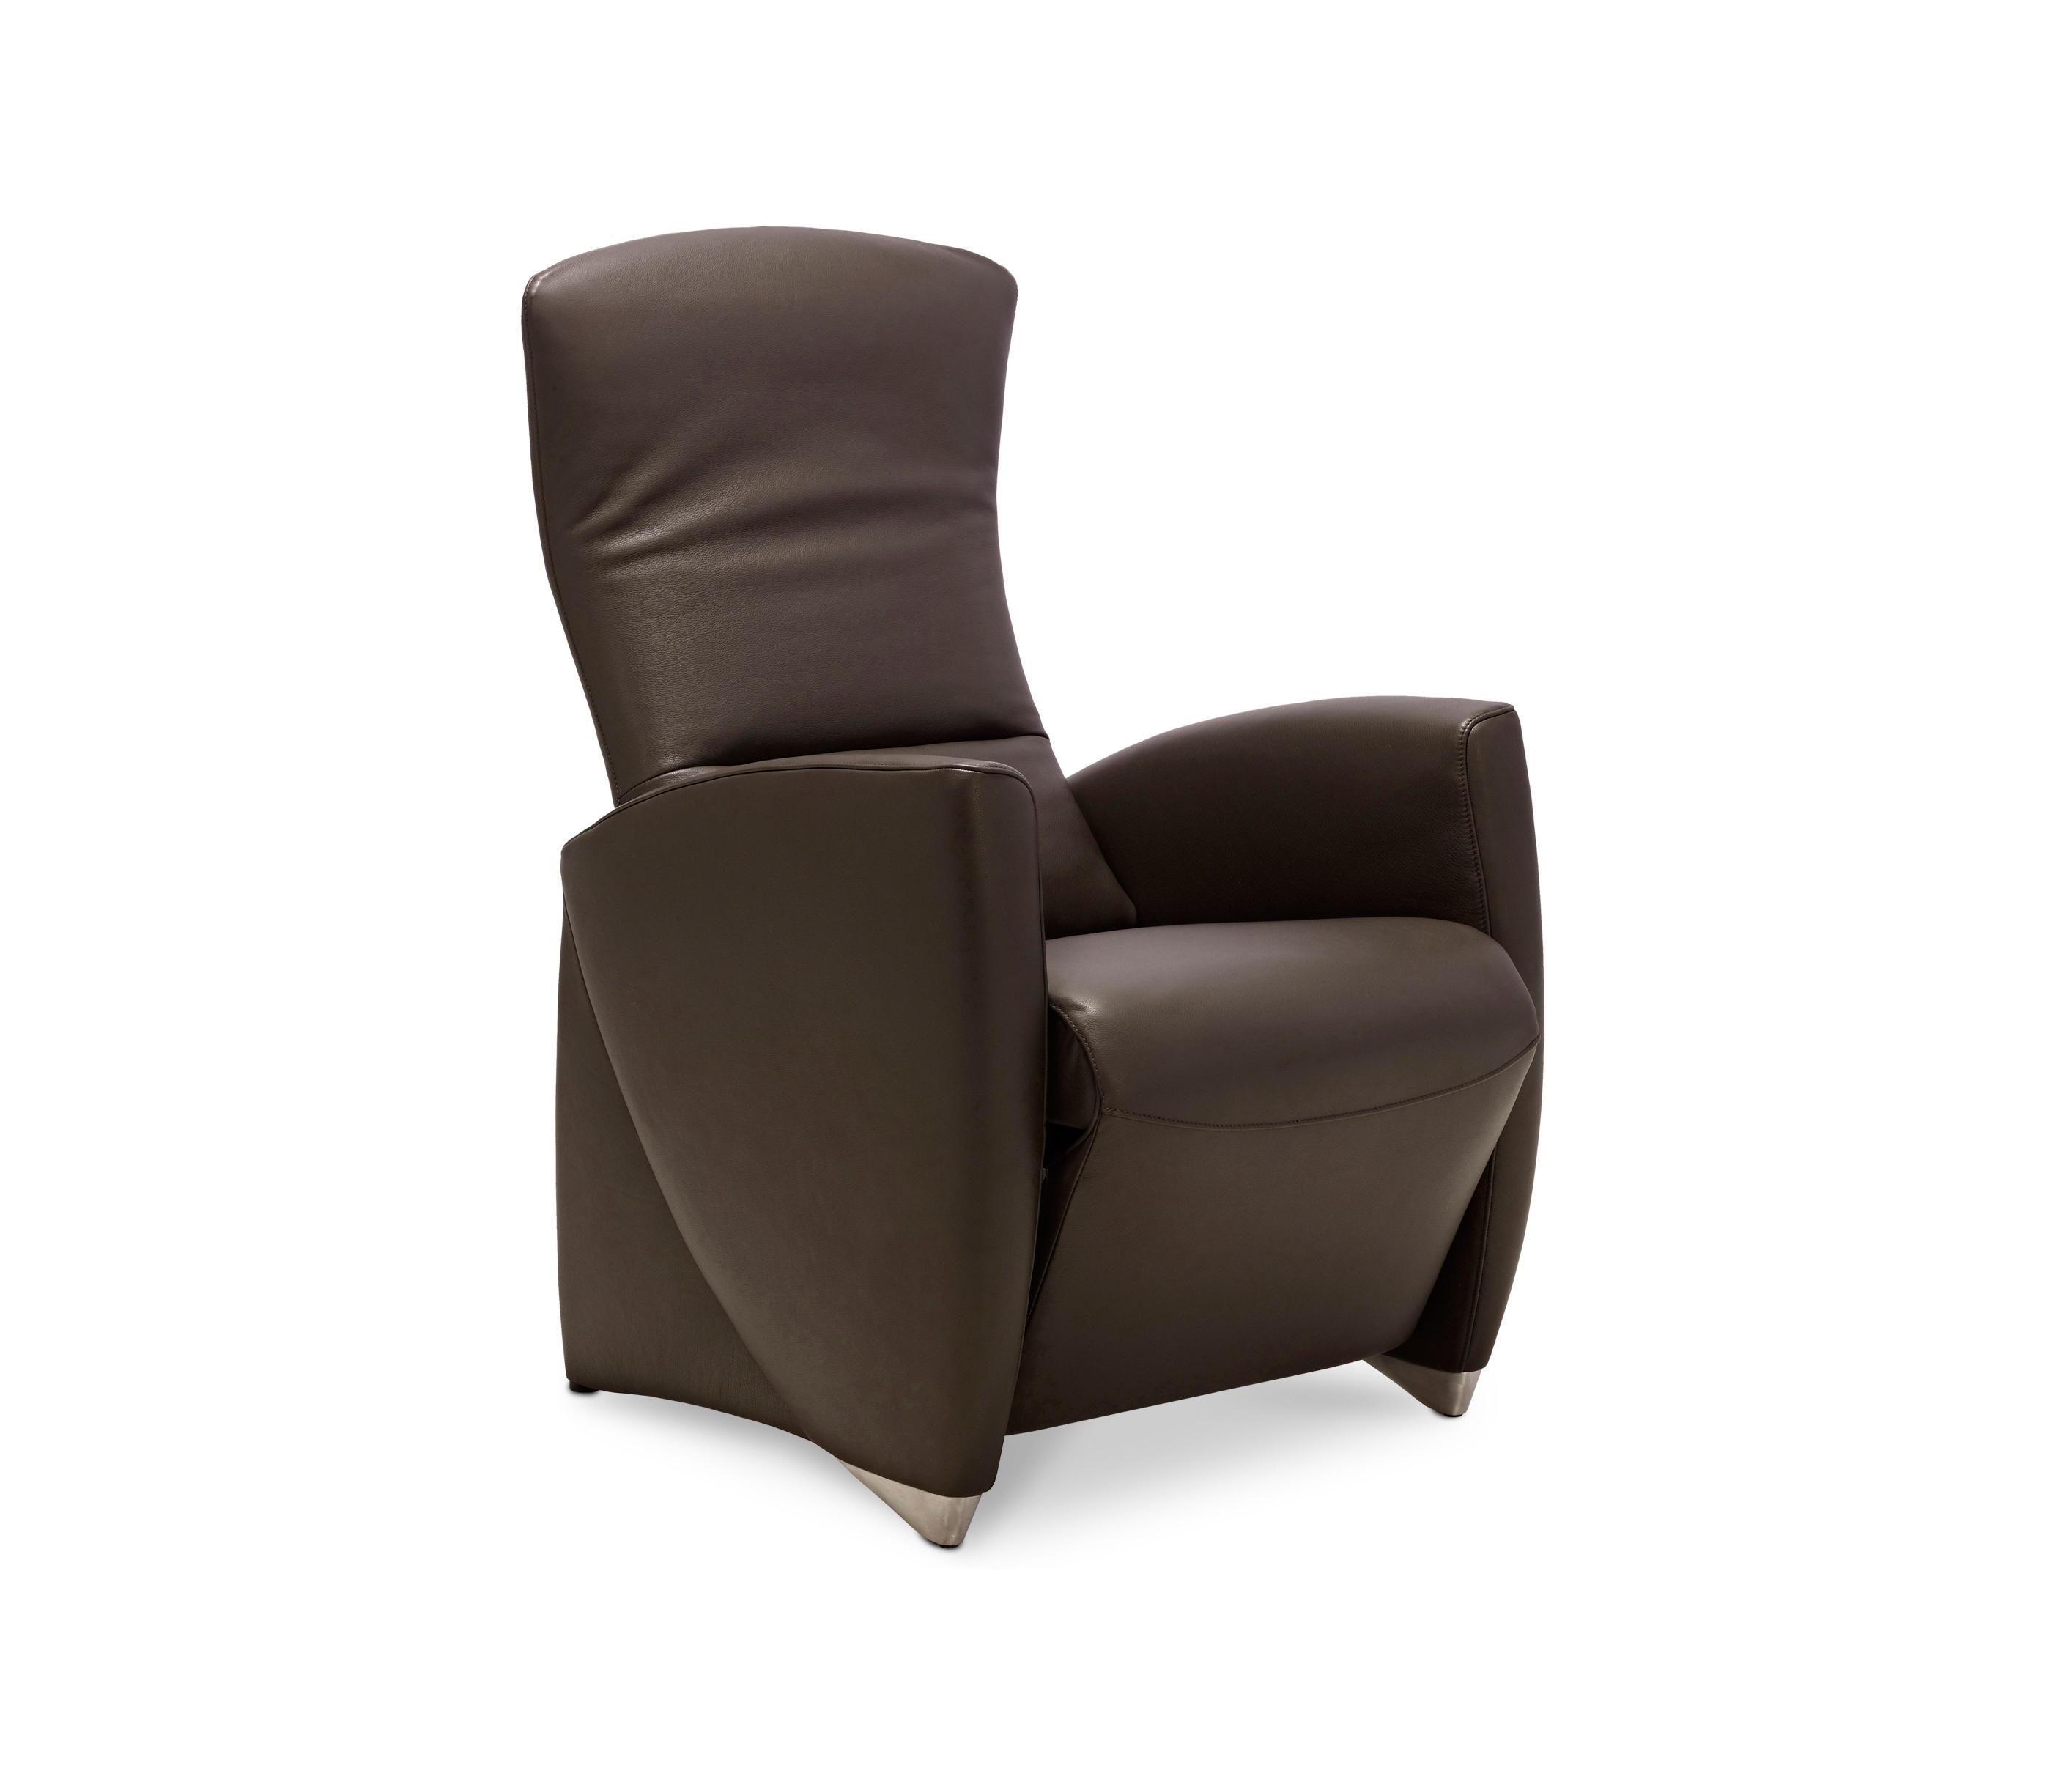 Vinci Relaxsessel Sessel Von Jori Architonic